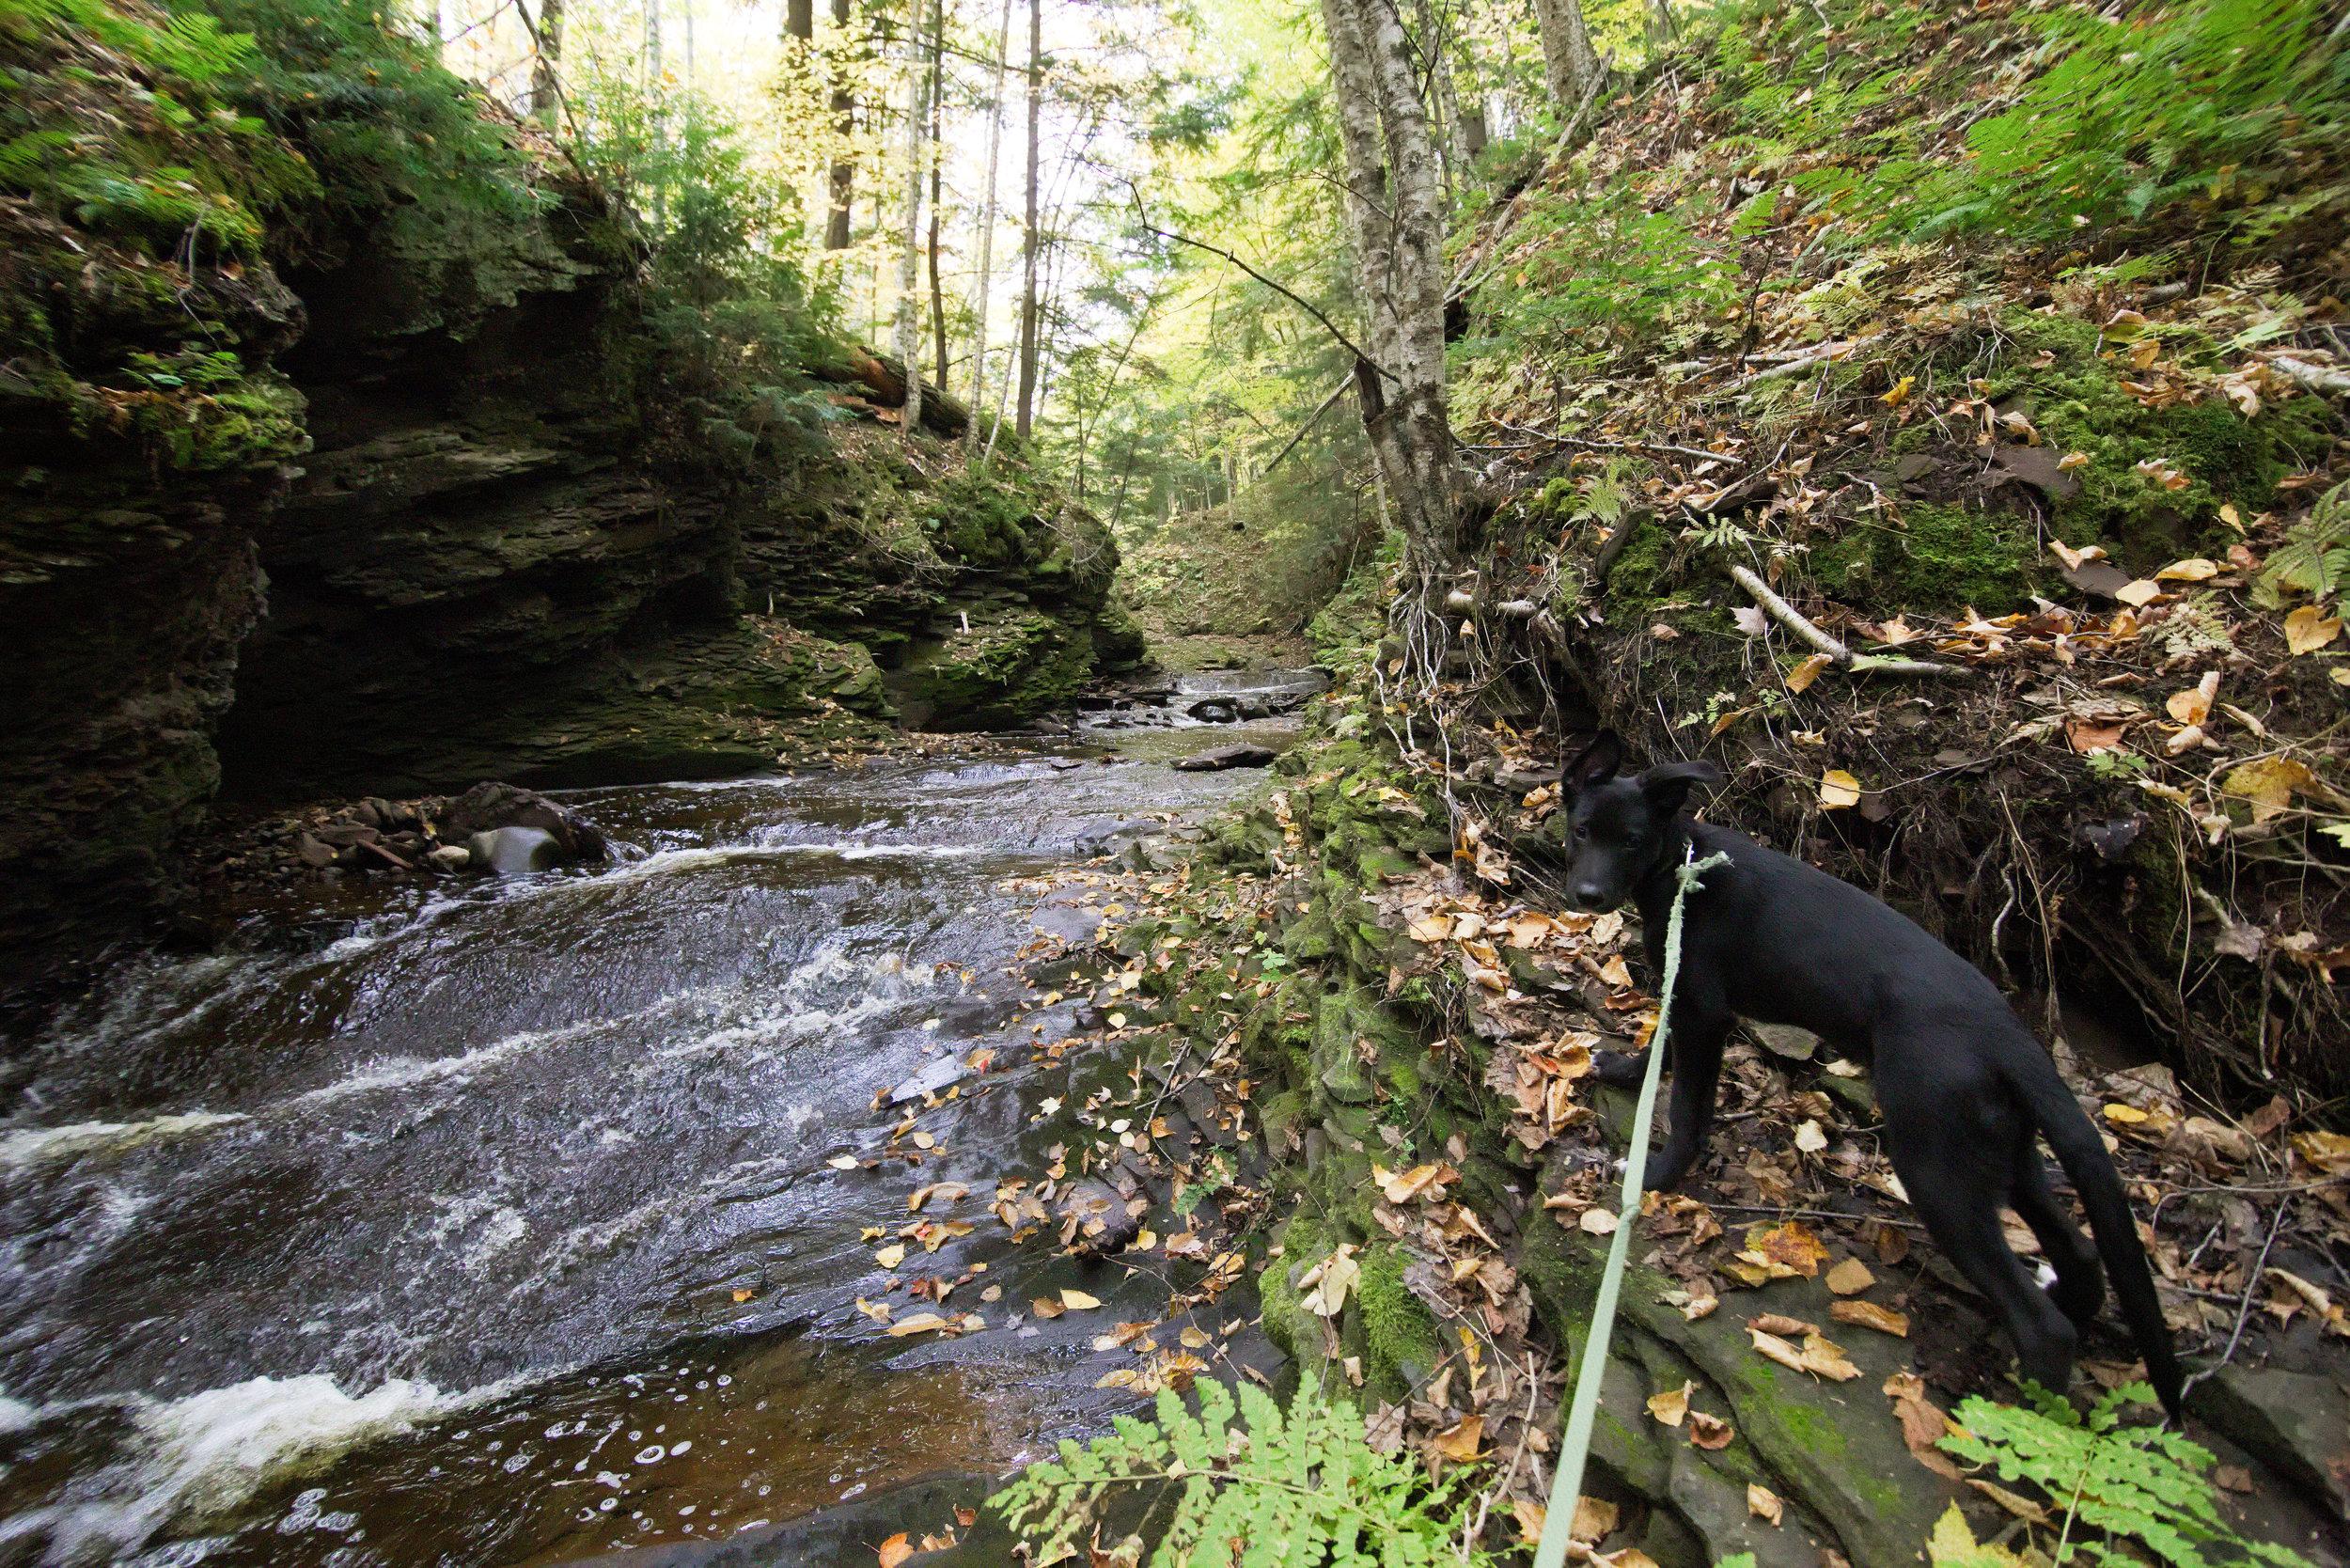 Oct 13 2017 Maple creek 4.jpg